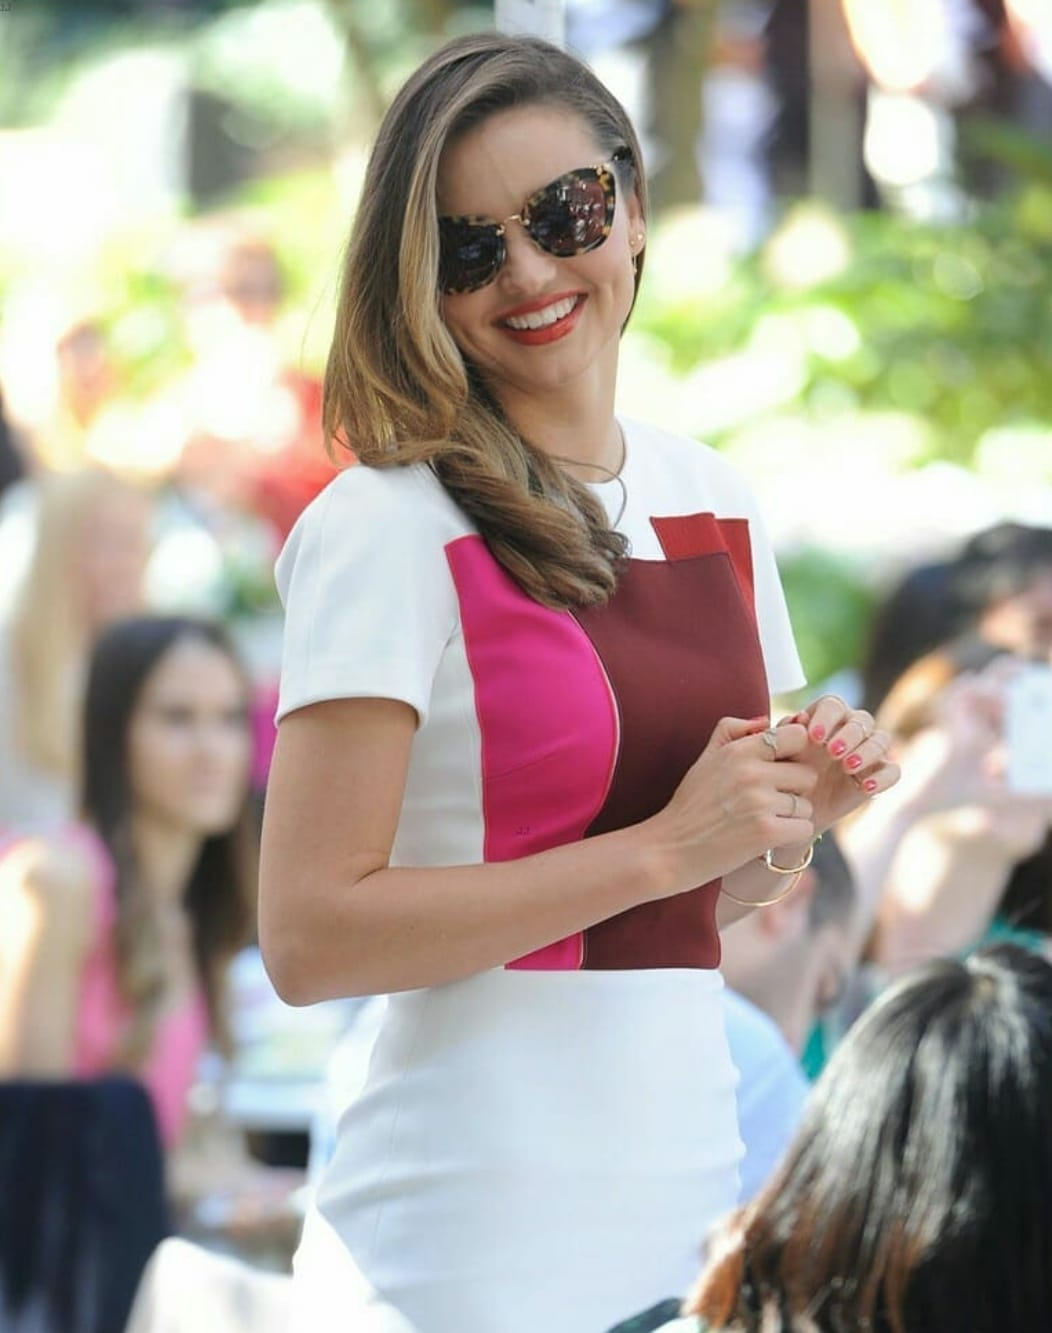 Miranda Kerr Latest Cute Photos in Casual Outfit